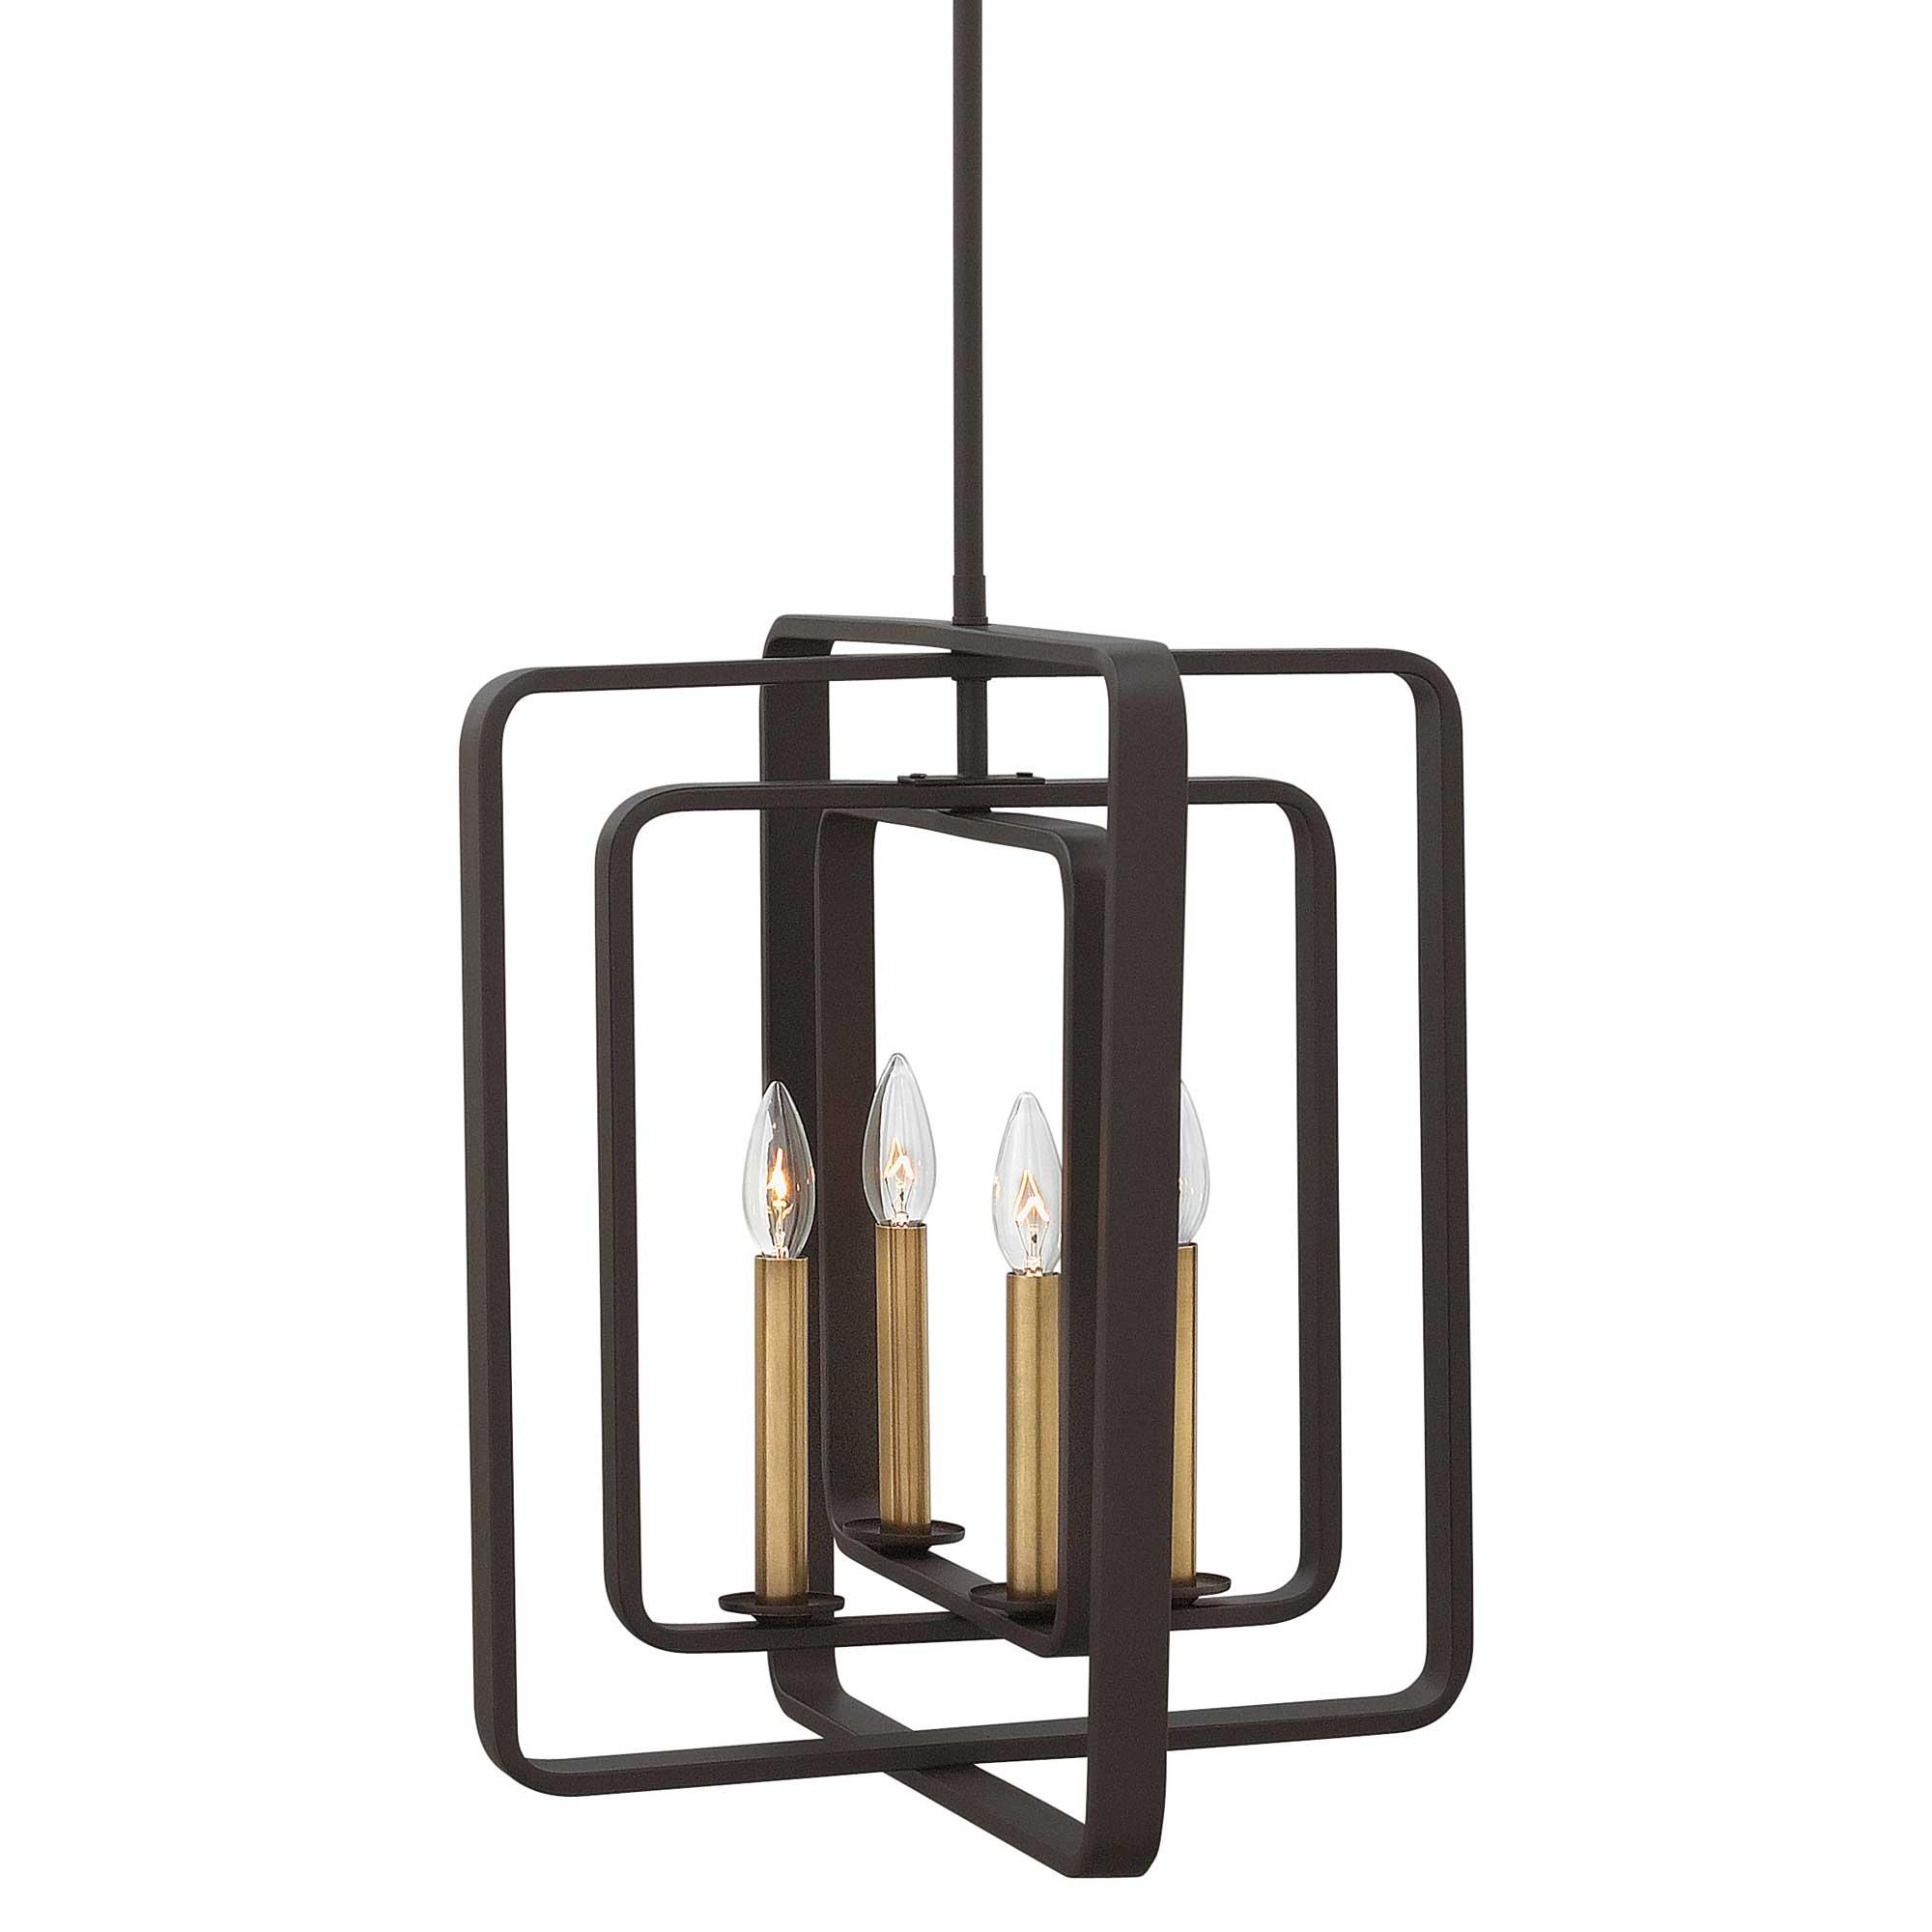 Pendant by hinkley lighting 4814kz quentin pendant by hinkley lighting 4814kz arubaitofo Images